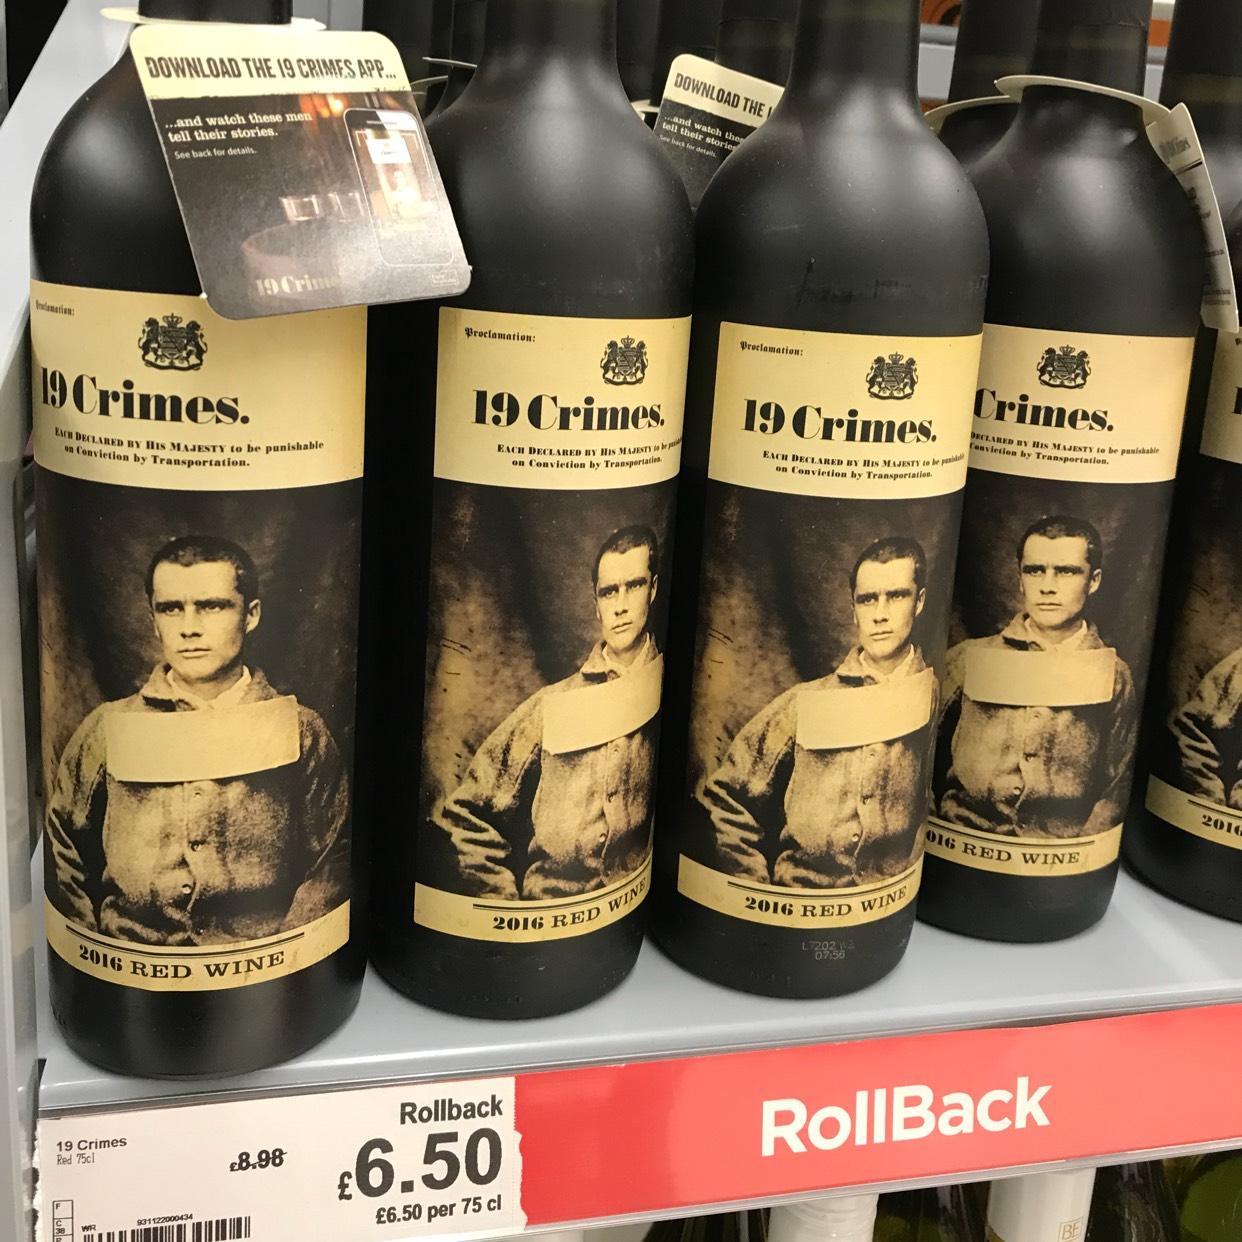 19 Crimes red wine down to £6.50 per bottle @ Asda